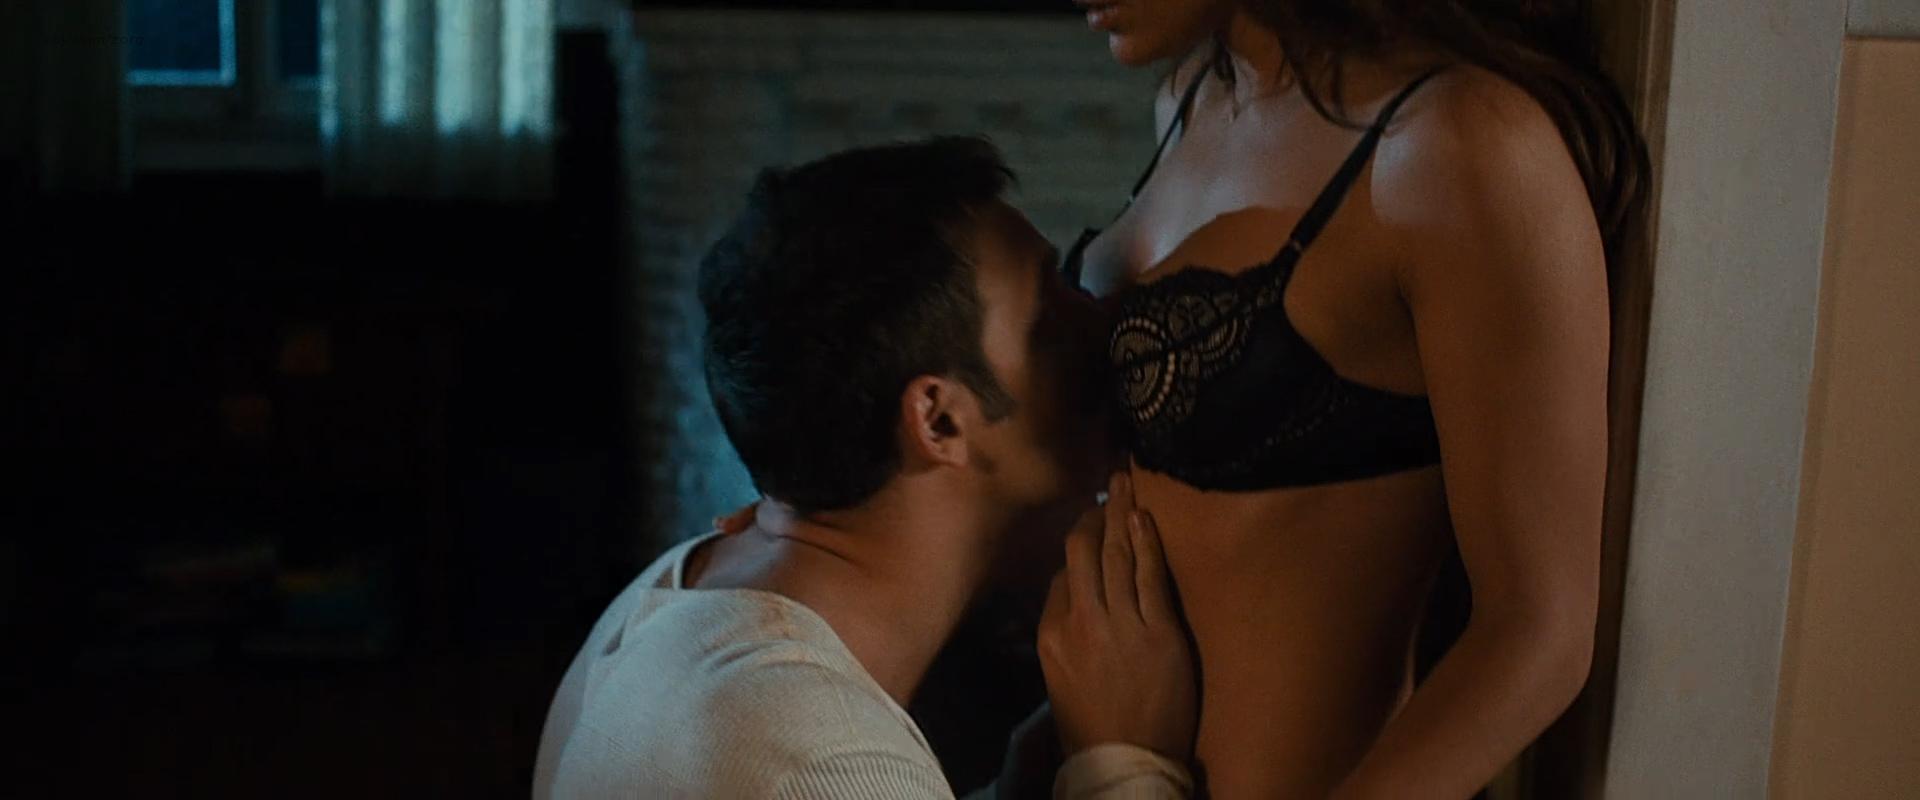 Jennifer Lopez Hot In Lingerie And Sex - The Boy Next Door 2015 Hd1080P-2680